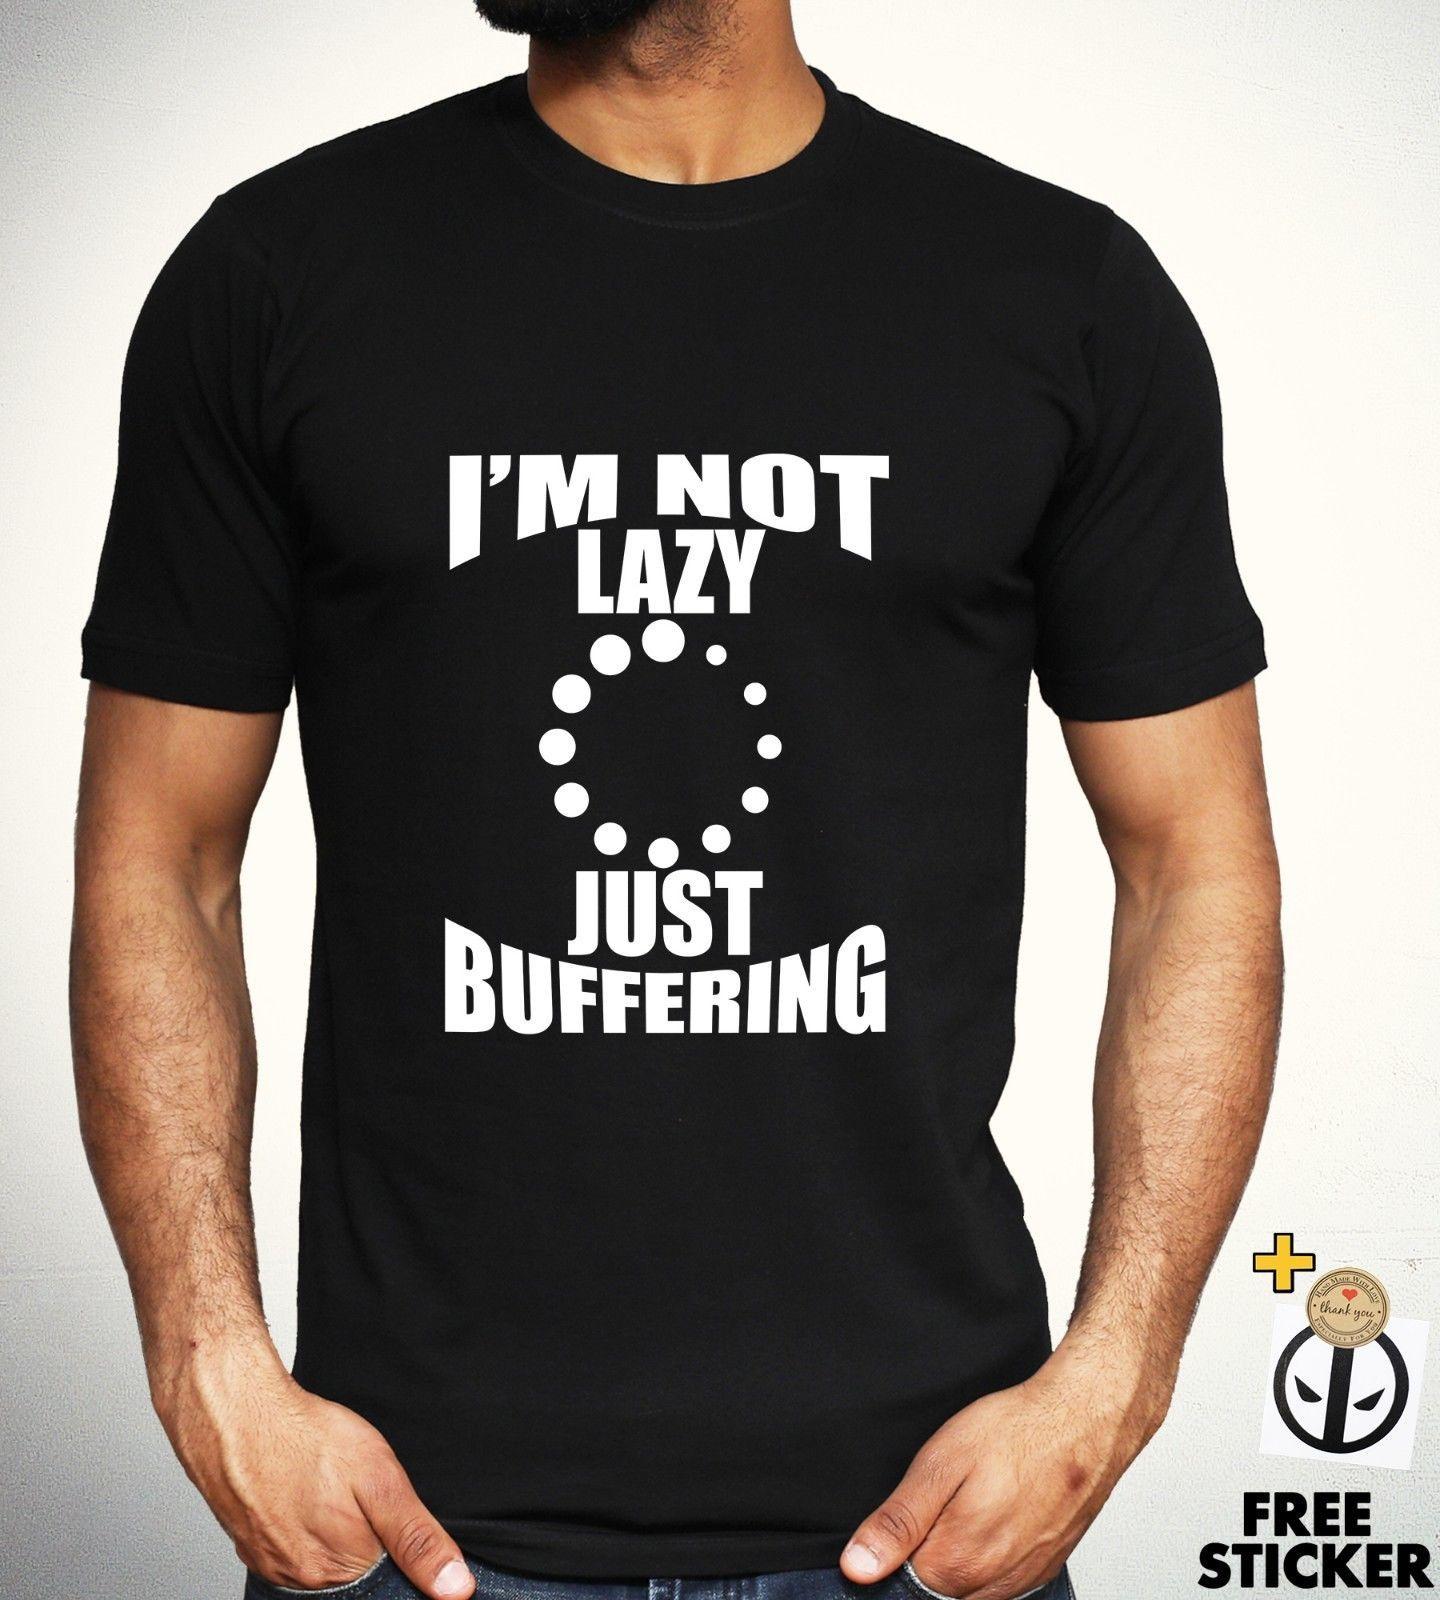 cbe547fa4 Not Lazy Just Buffering T-shirt Funny Novelty Parody Fashion Tee Gift Top  Mens